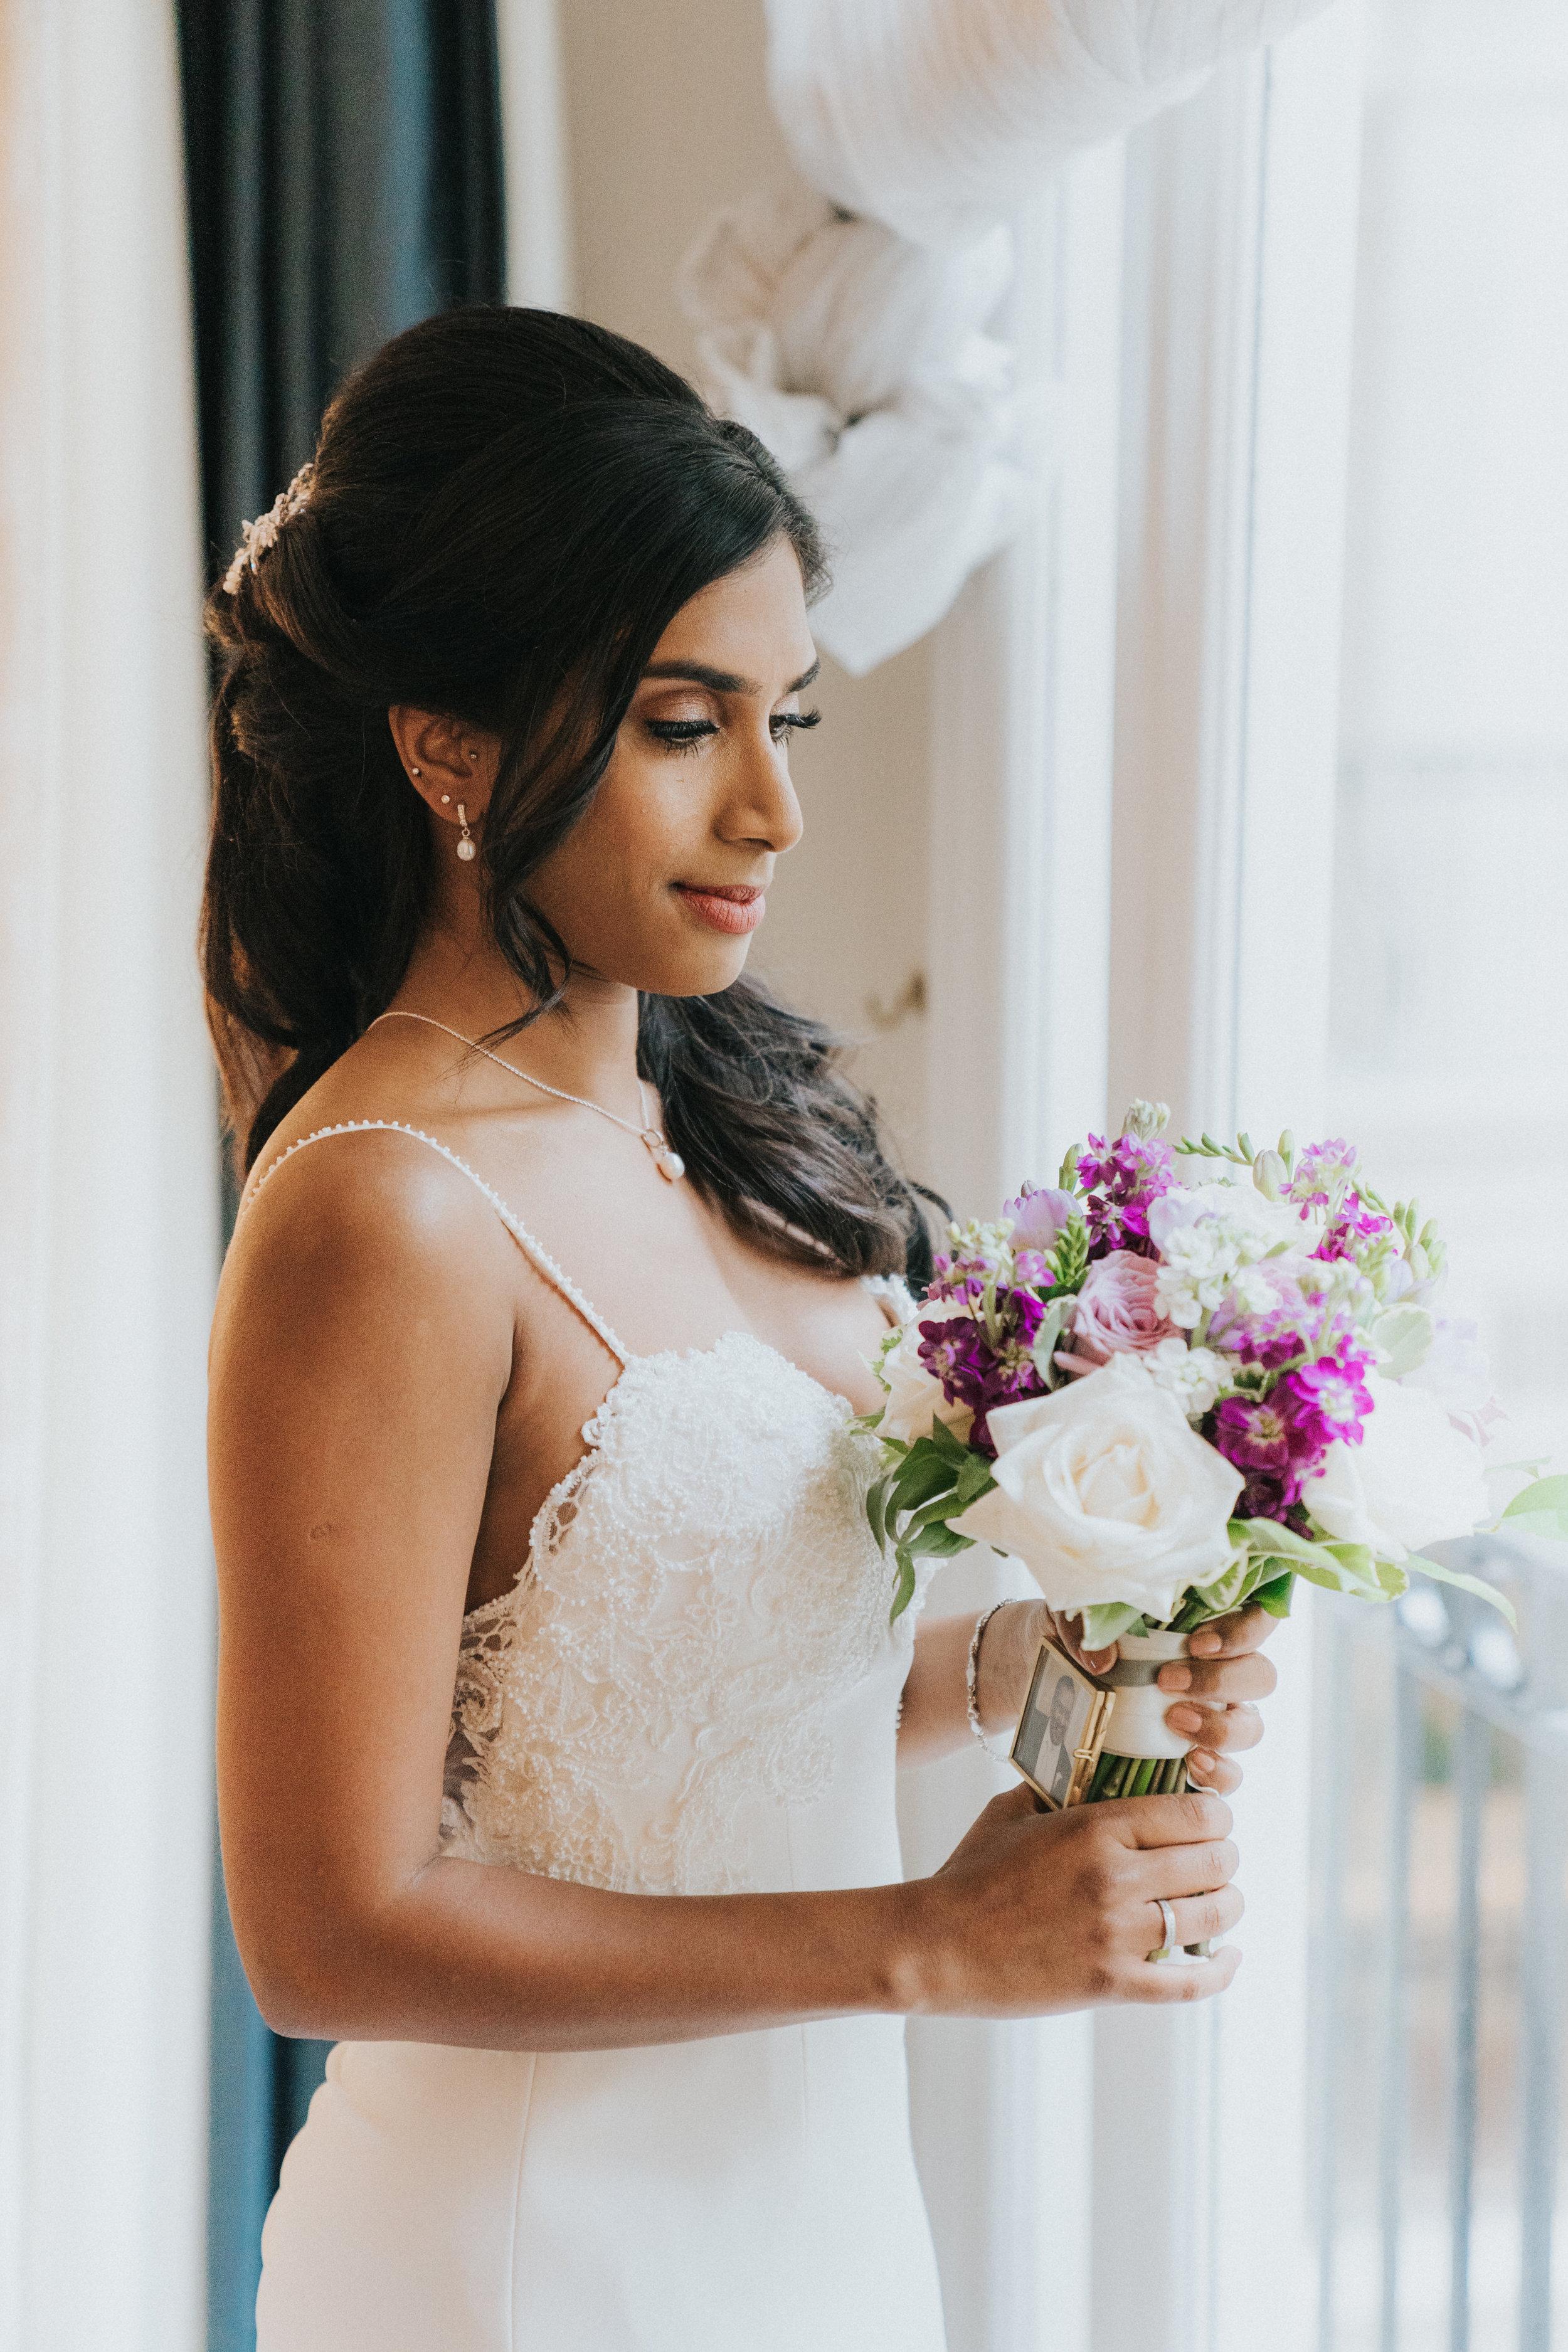 anglo-asian-hindu-civil-wedding-photography-videography-london-portrait-1